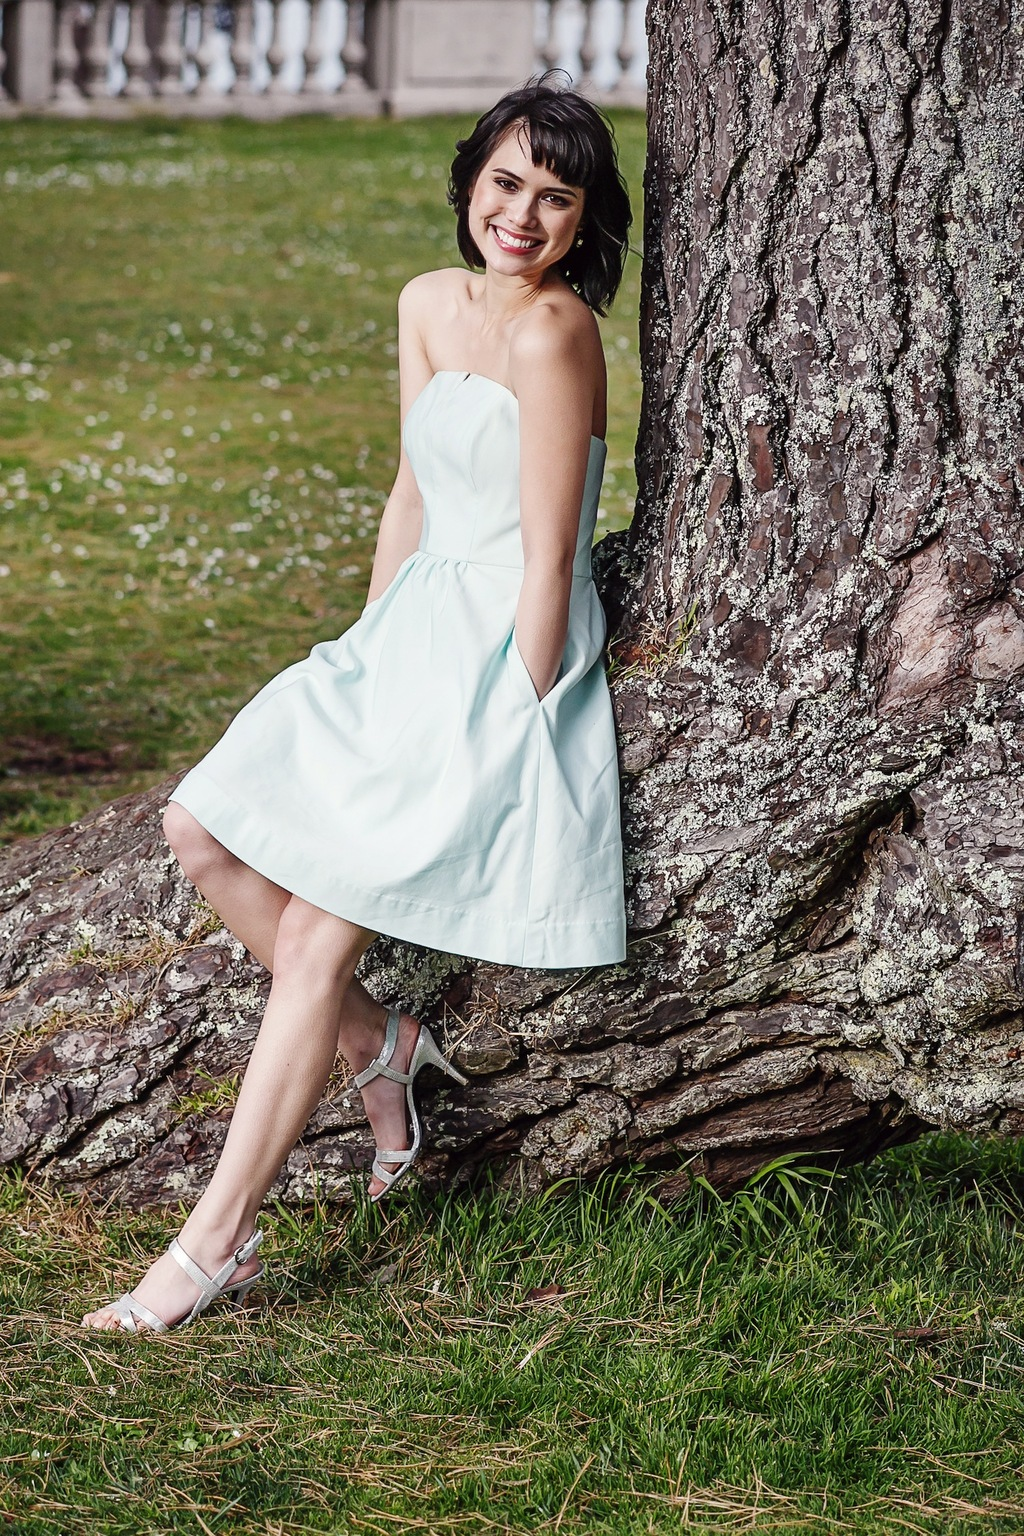 Elizabeth_bridesmaids_dress_by_weddington_way.full